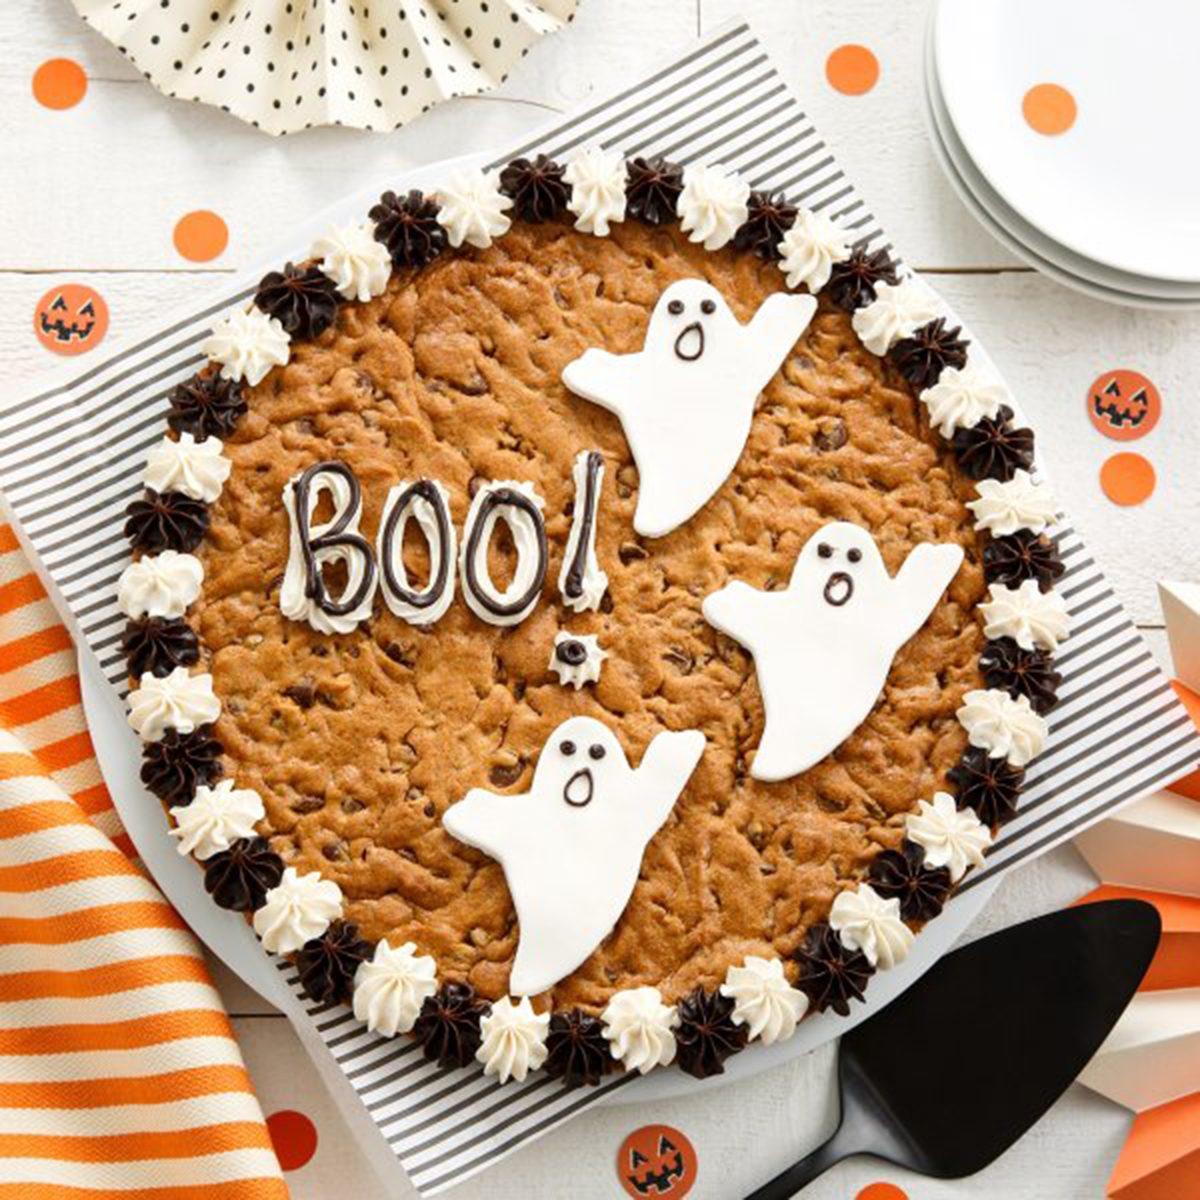 SAY BOO! COOKIE CAKE